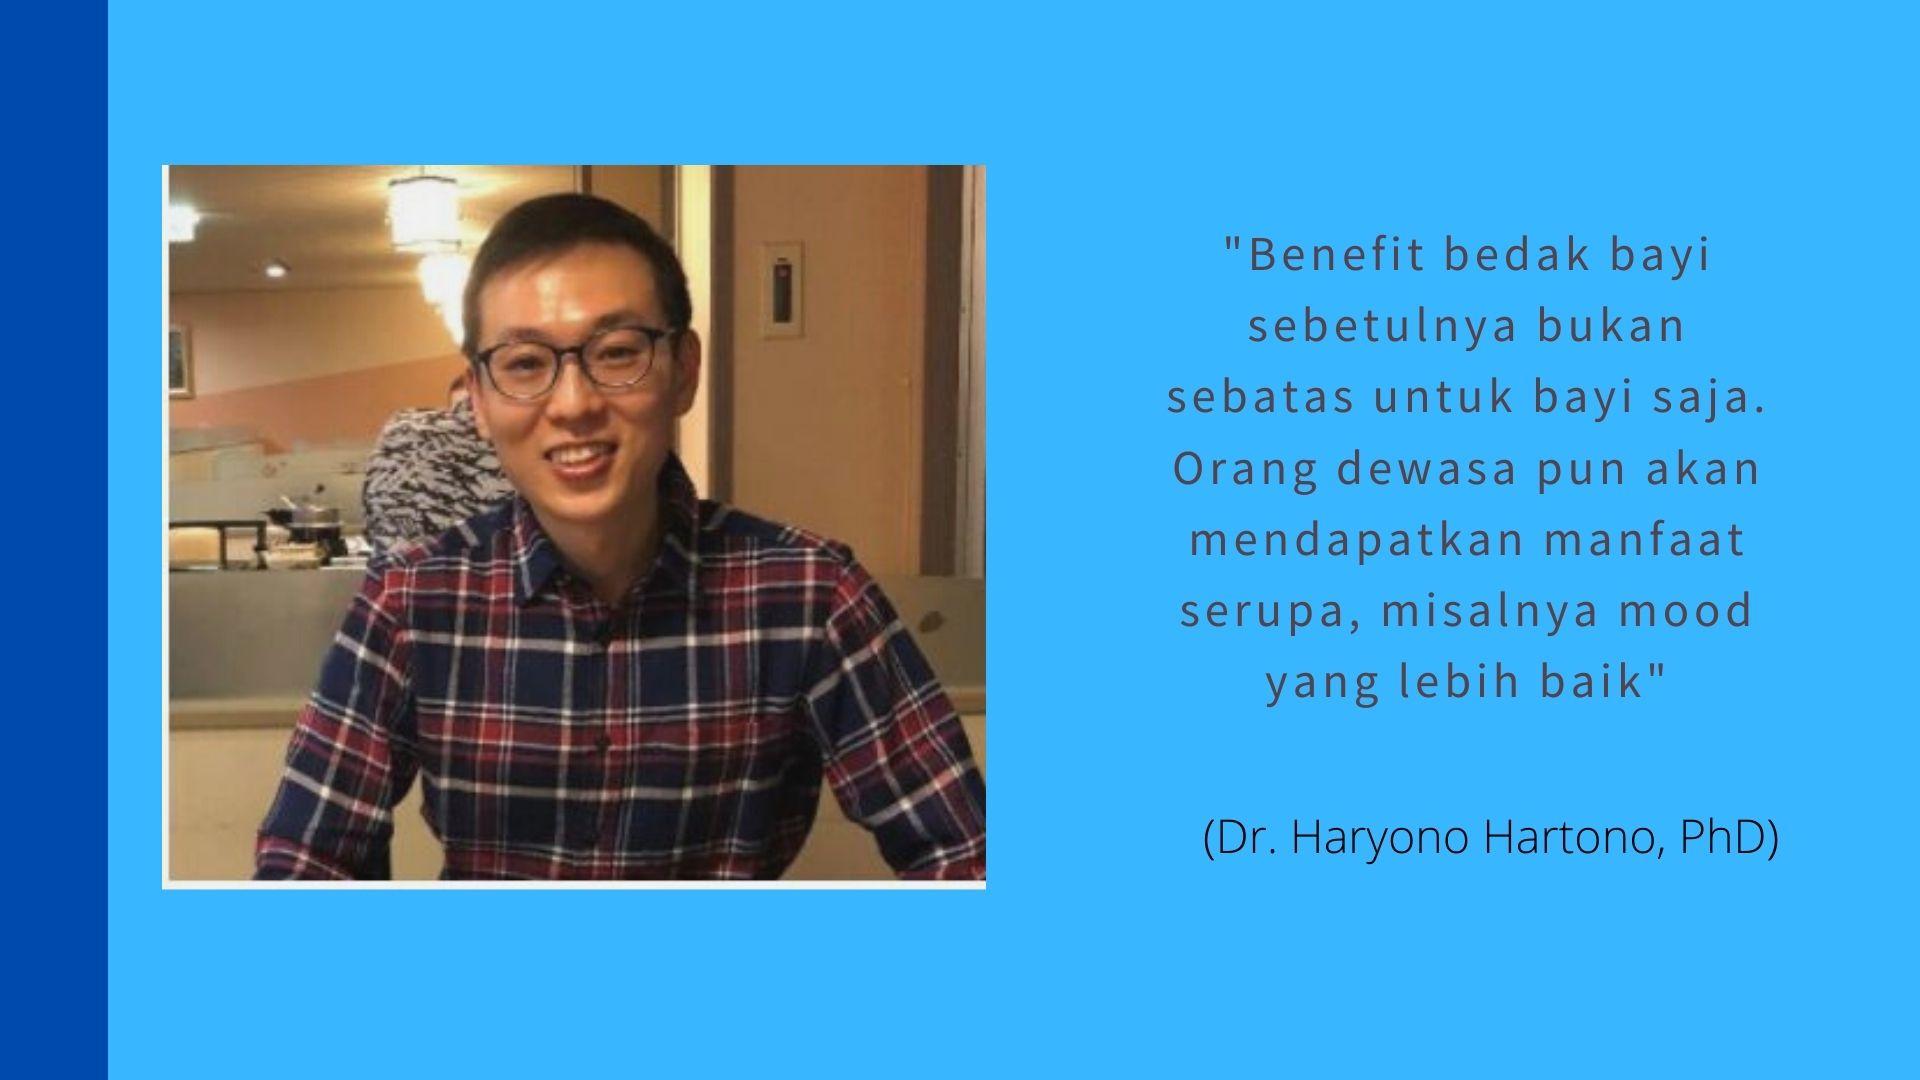 Dr. Haryono Hartono, PhD